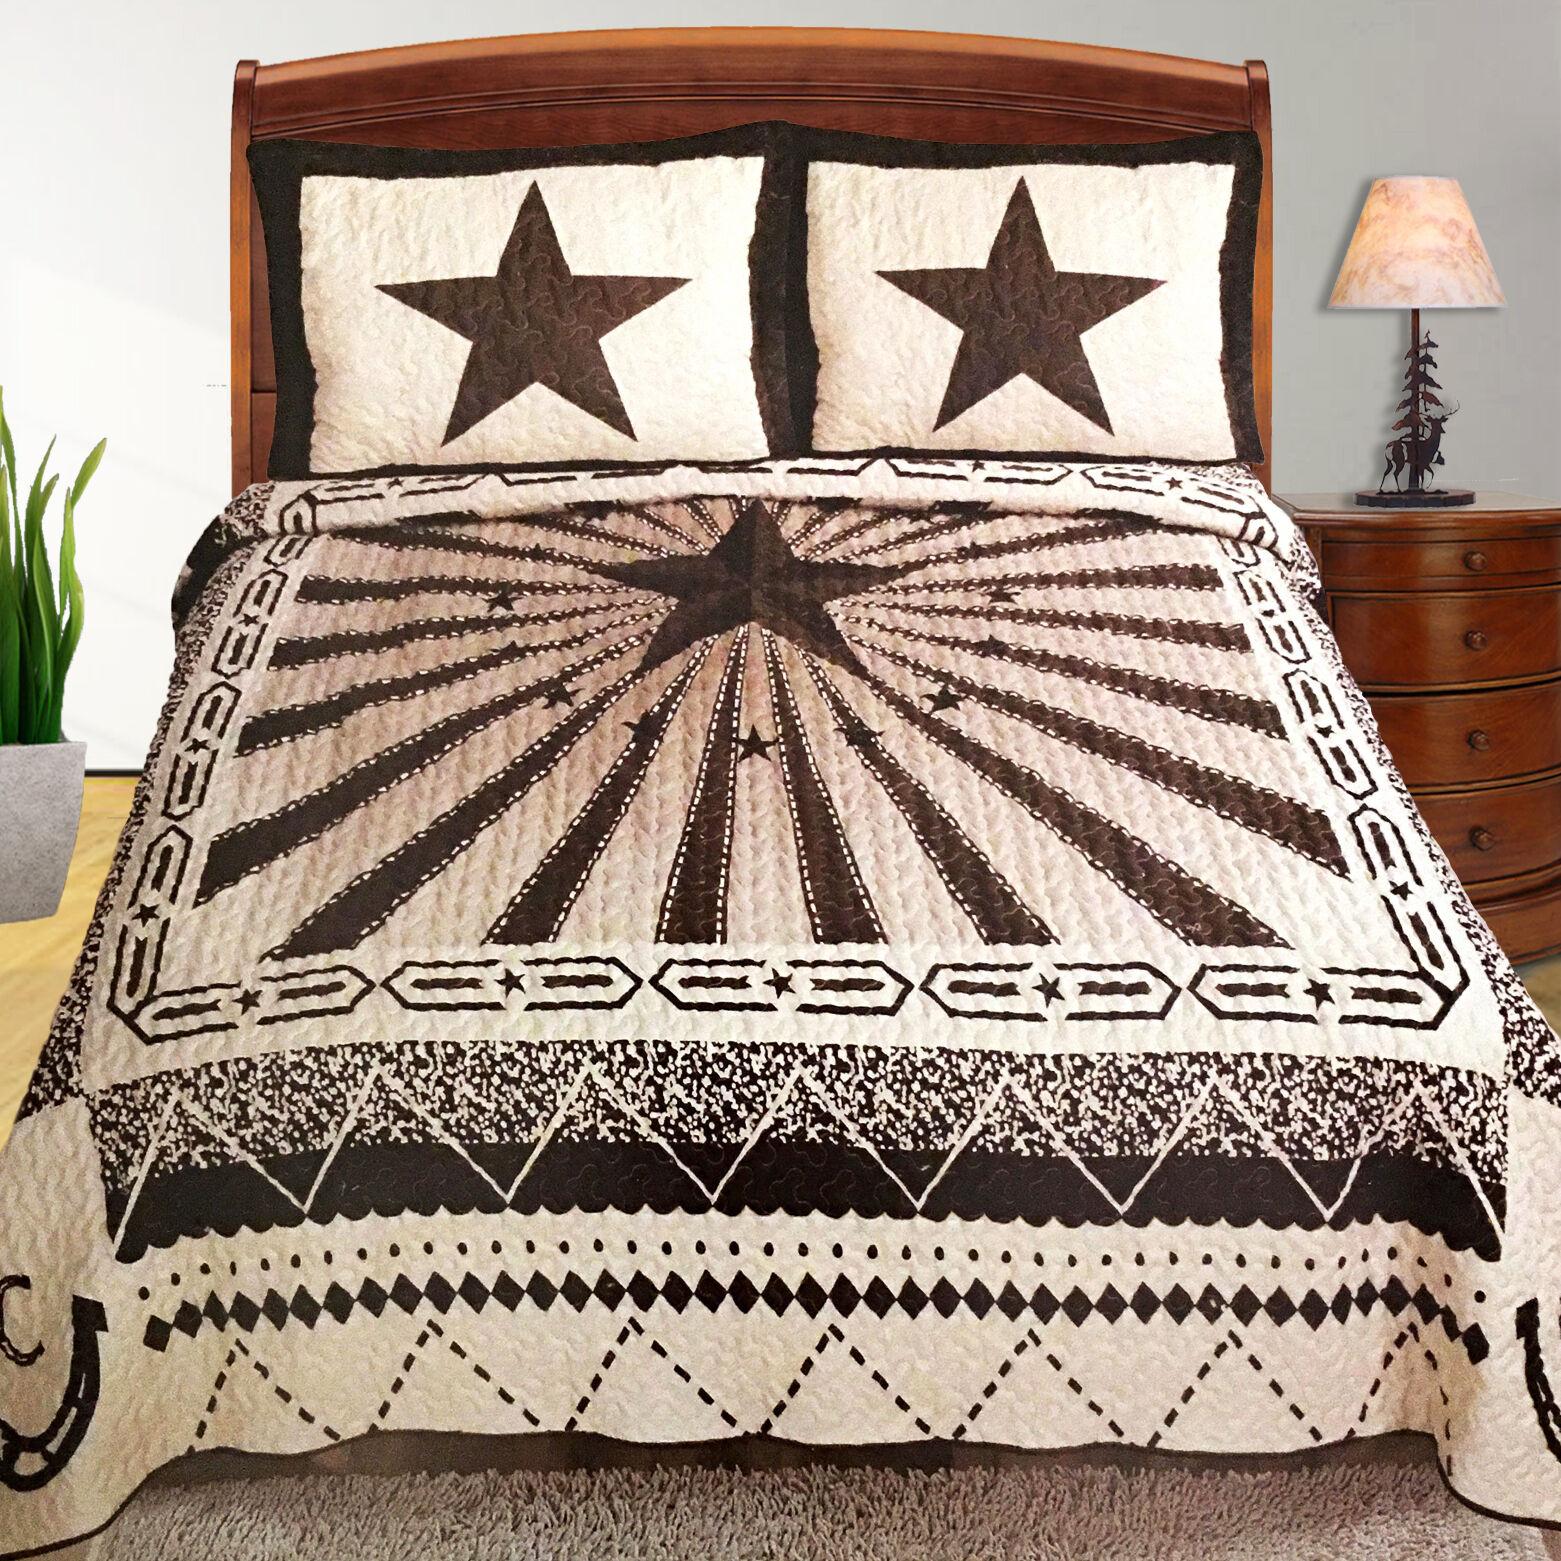 Western Texas Star Horse Cowboy Horseshoe 3 Pc Bedspread Quilt Set Queen Beige